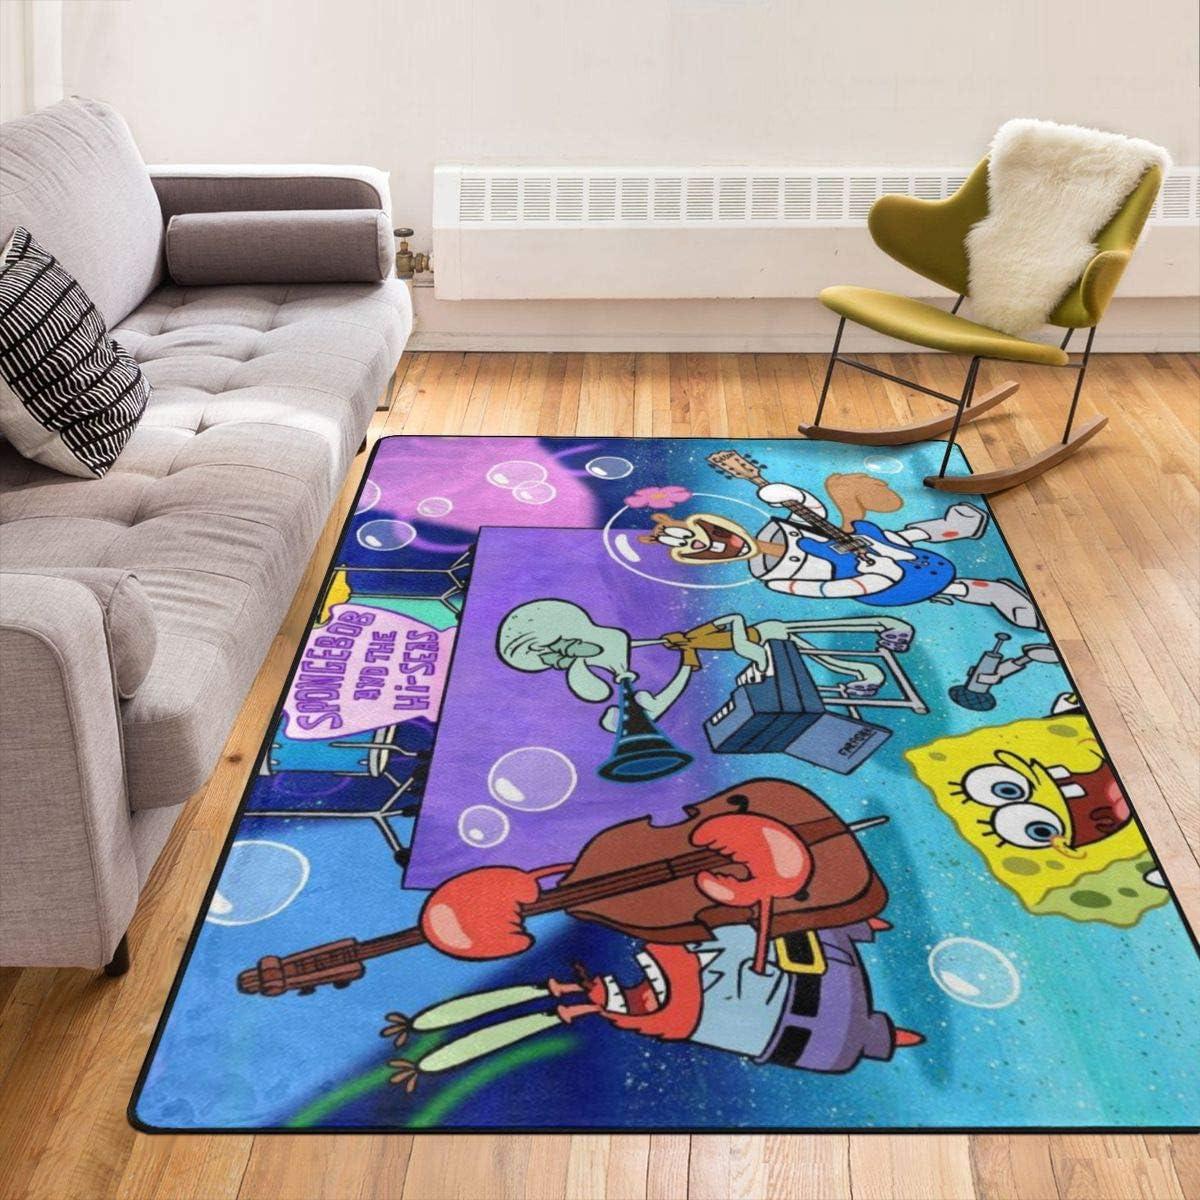 Beautiful Spongebob Squarepants Super Soft Modern Non Slip Living Room Rug Home Kitchen Carpets Rugs